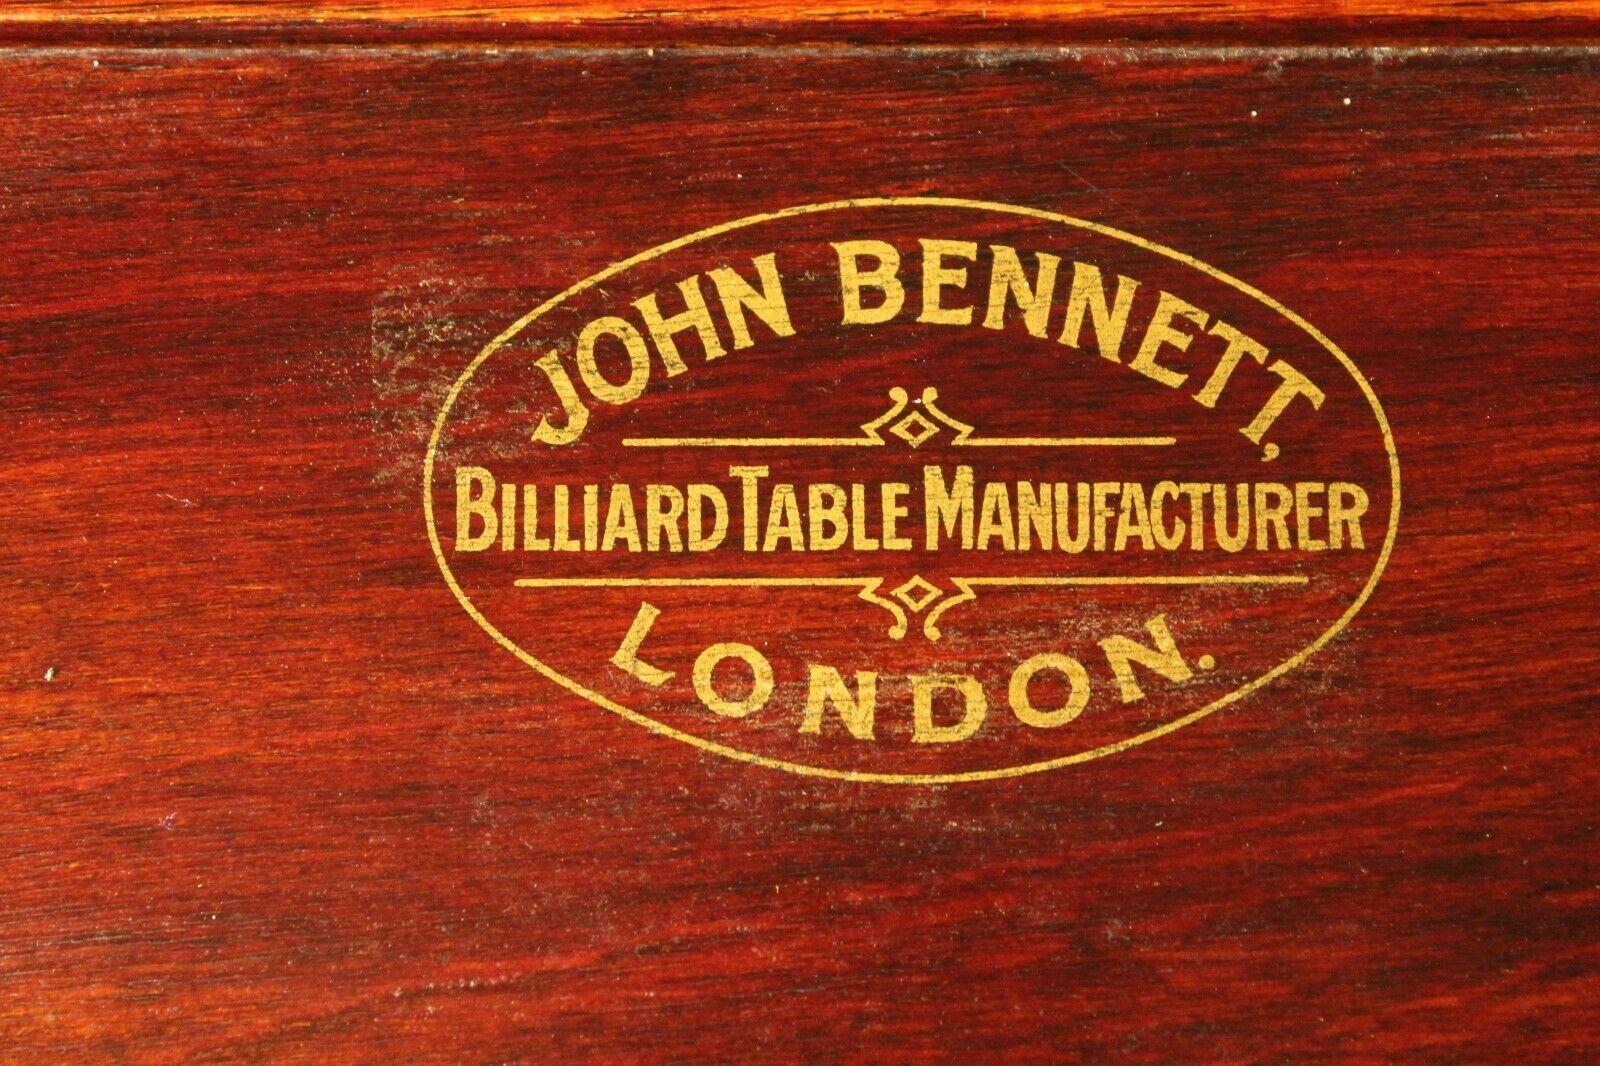 RARE ANTIQUE JOHN BENNETT OF LONDON SNOOKER SCOREBOARD BILLIARDS